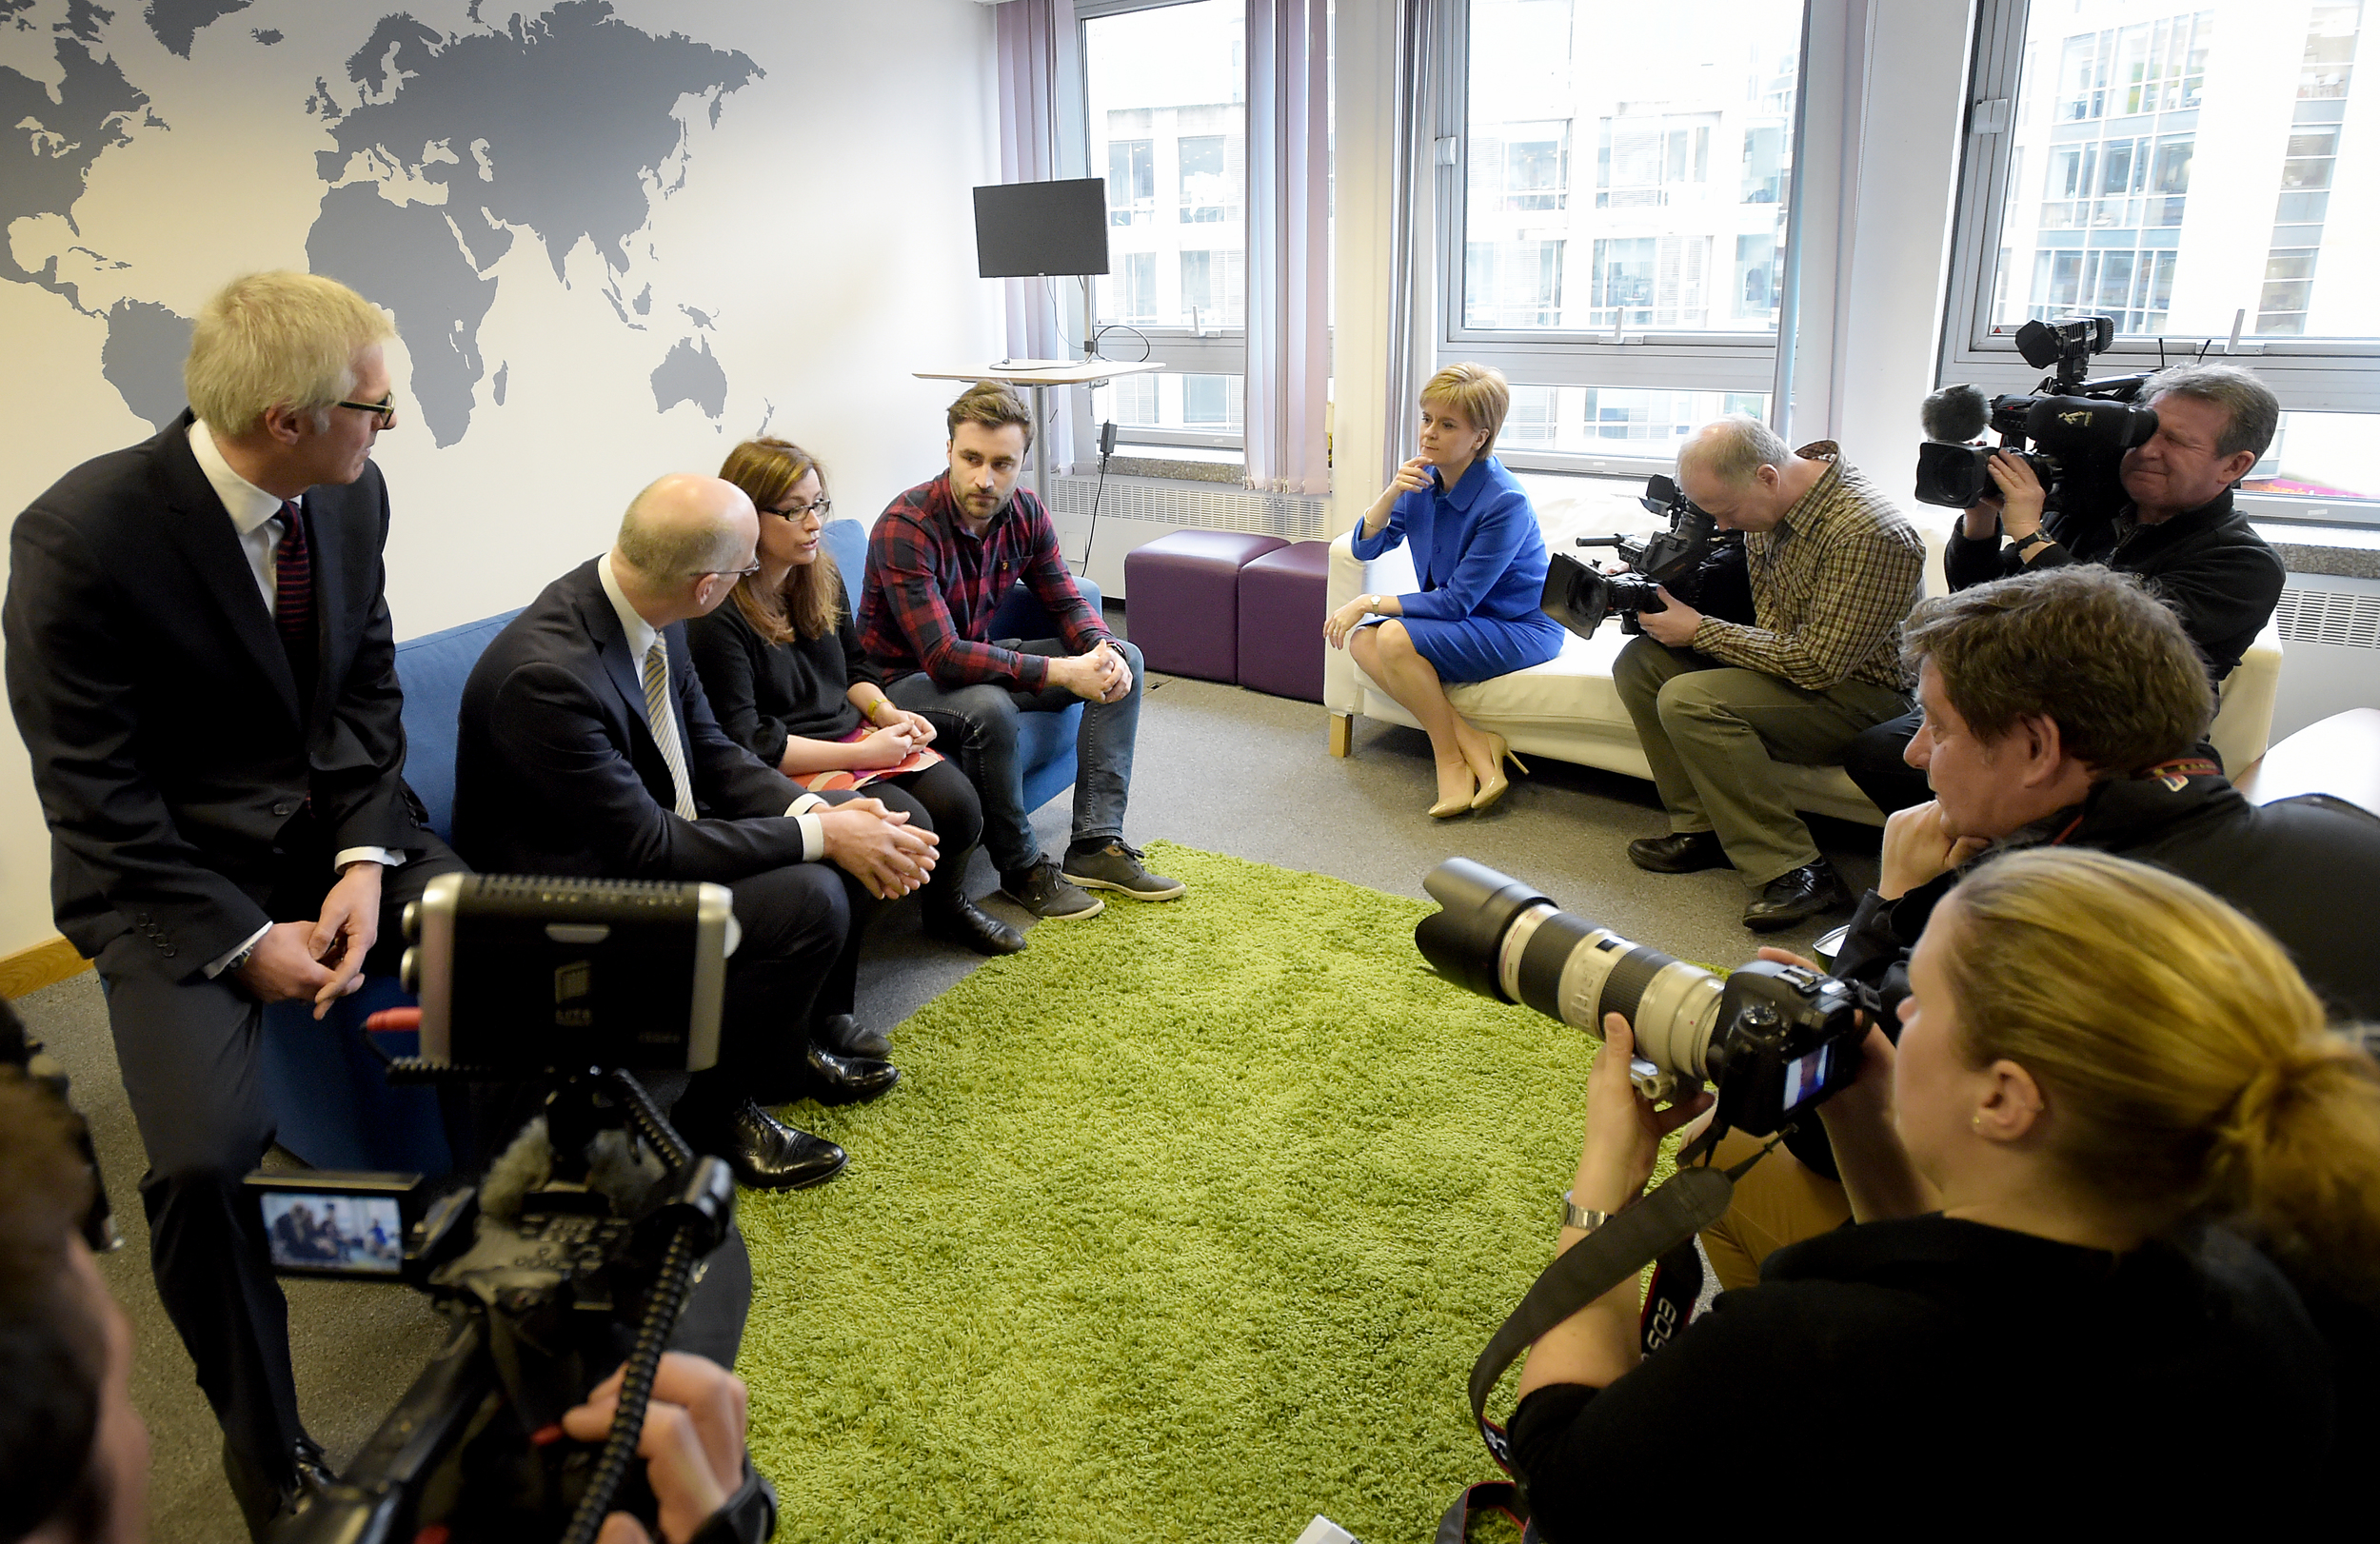 Michael Groves (Topolytics), Jude Cook (ShareIn) and Eddie Robb (Make It Social) with FM Nicola Sturgeon and DFM John Swinney